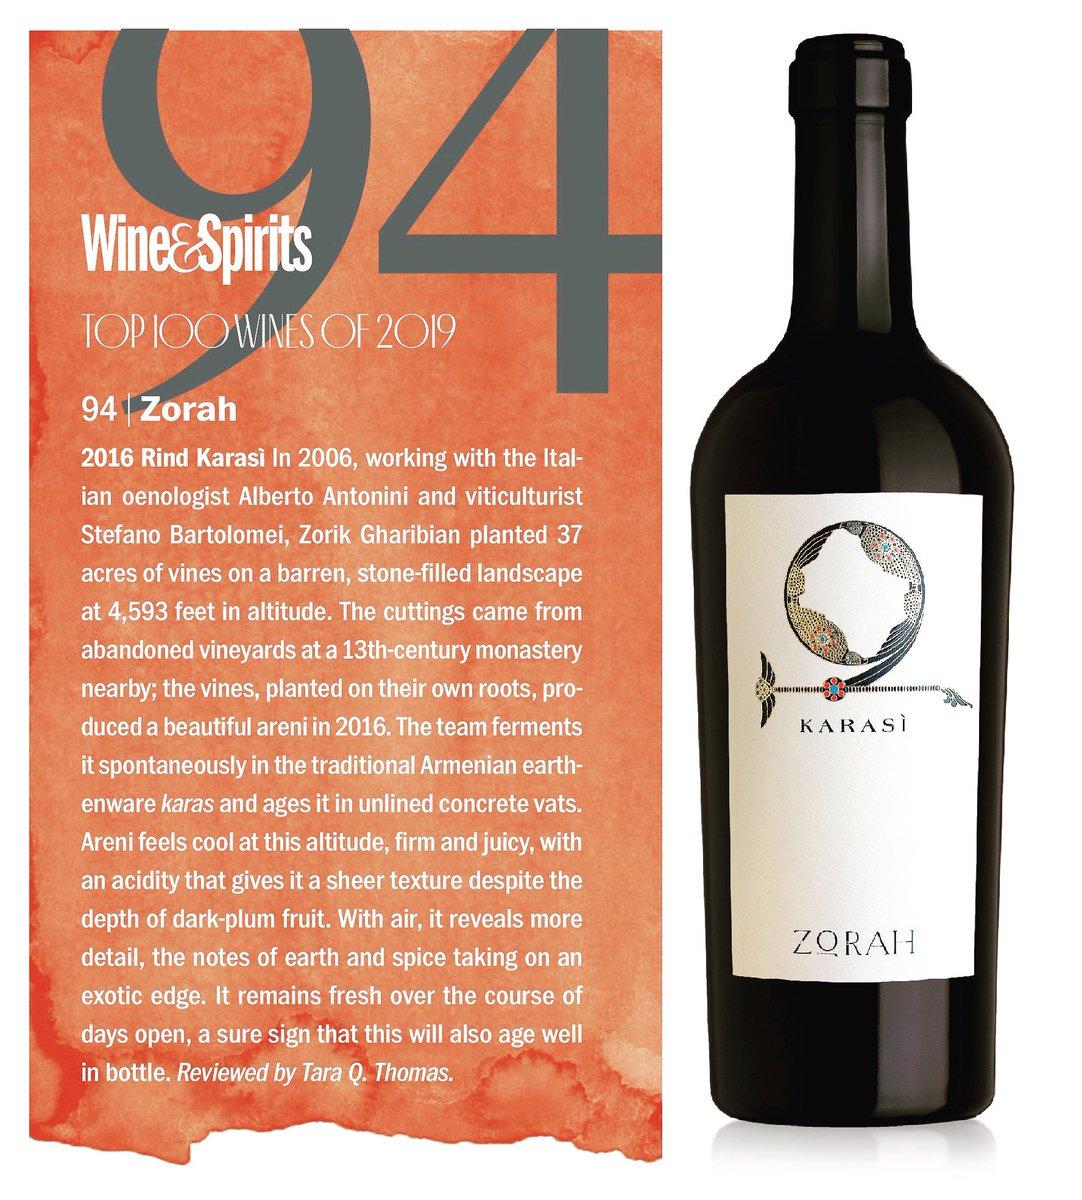 Multi Award Winning and Delicious ZORAH Wines are available in the USA  at http://WinesofArmenia.com + FREE shipping on any 6 or more bottles. #zorah #zorahwines #yeraz #voski #karasi #rind #armenia #armenian #wineofarmenia #winesofarmenia #armenianwine #armenianwines @StepanWBpic.twitter.com/nGddCuv8Zs